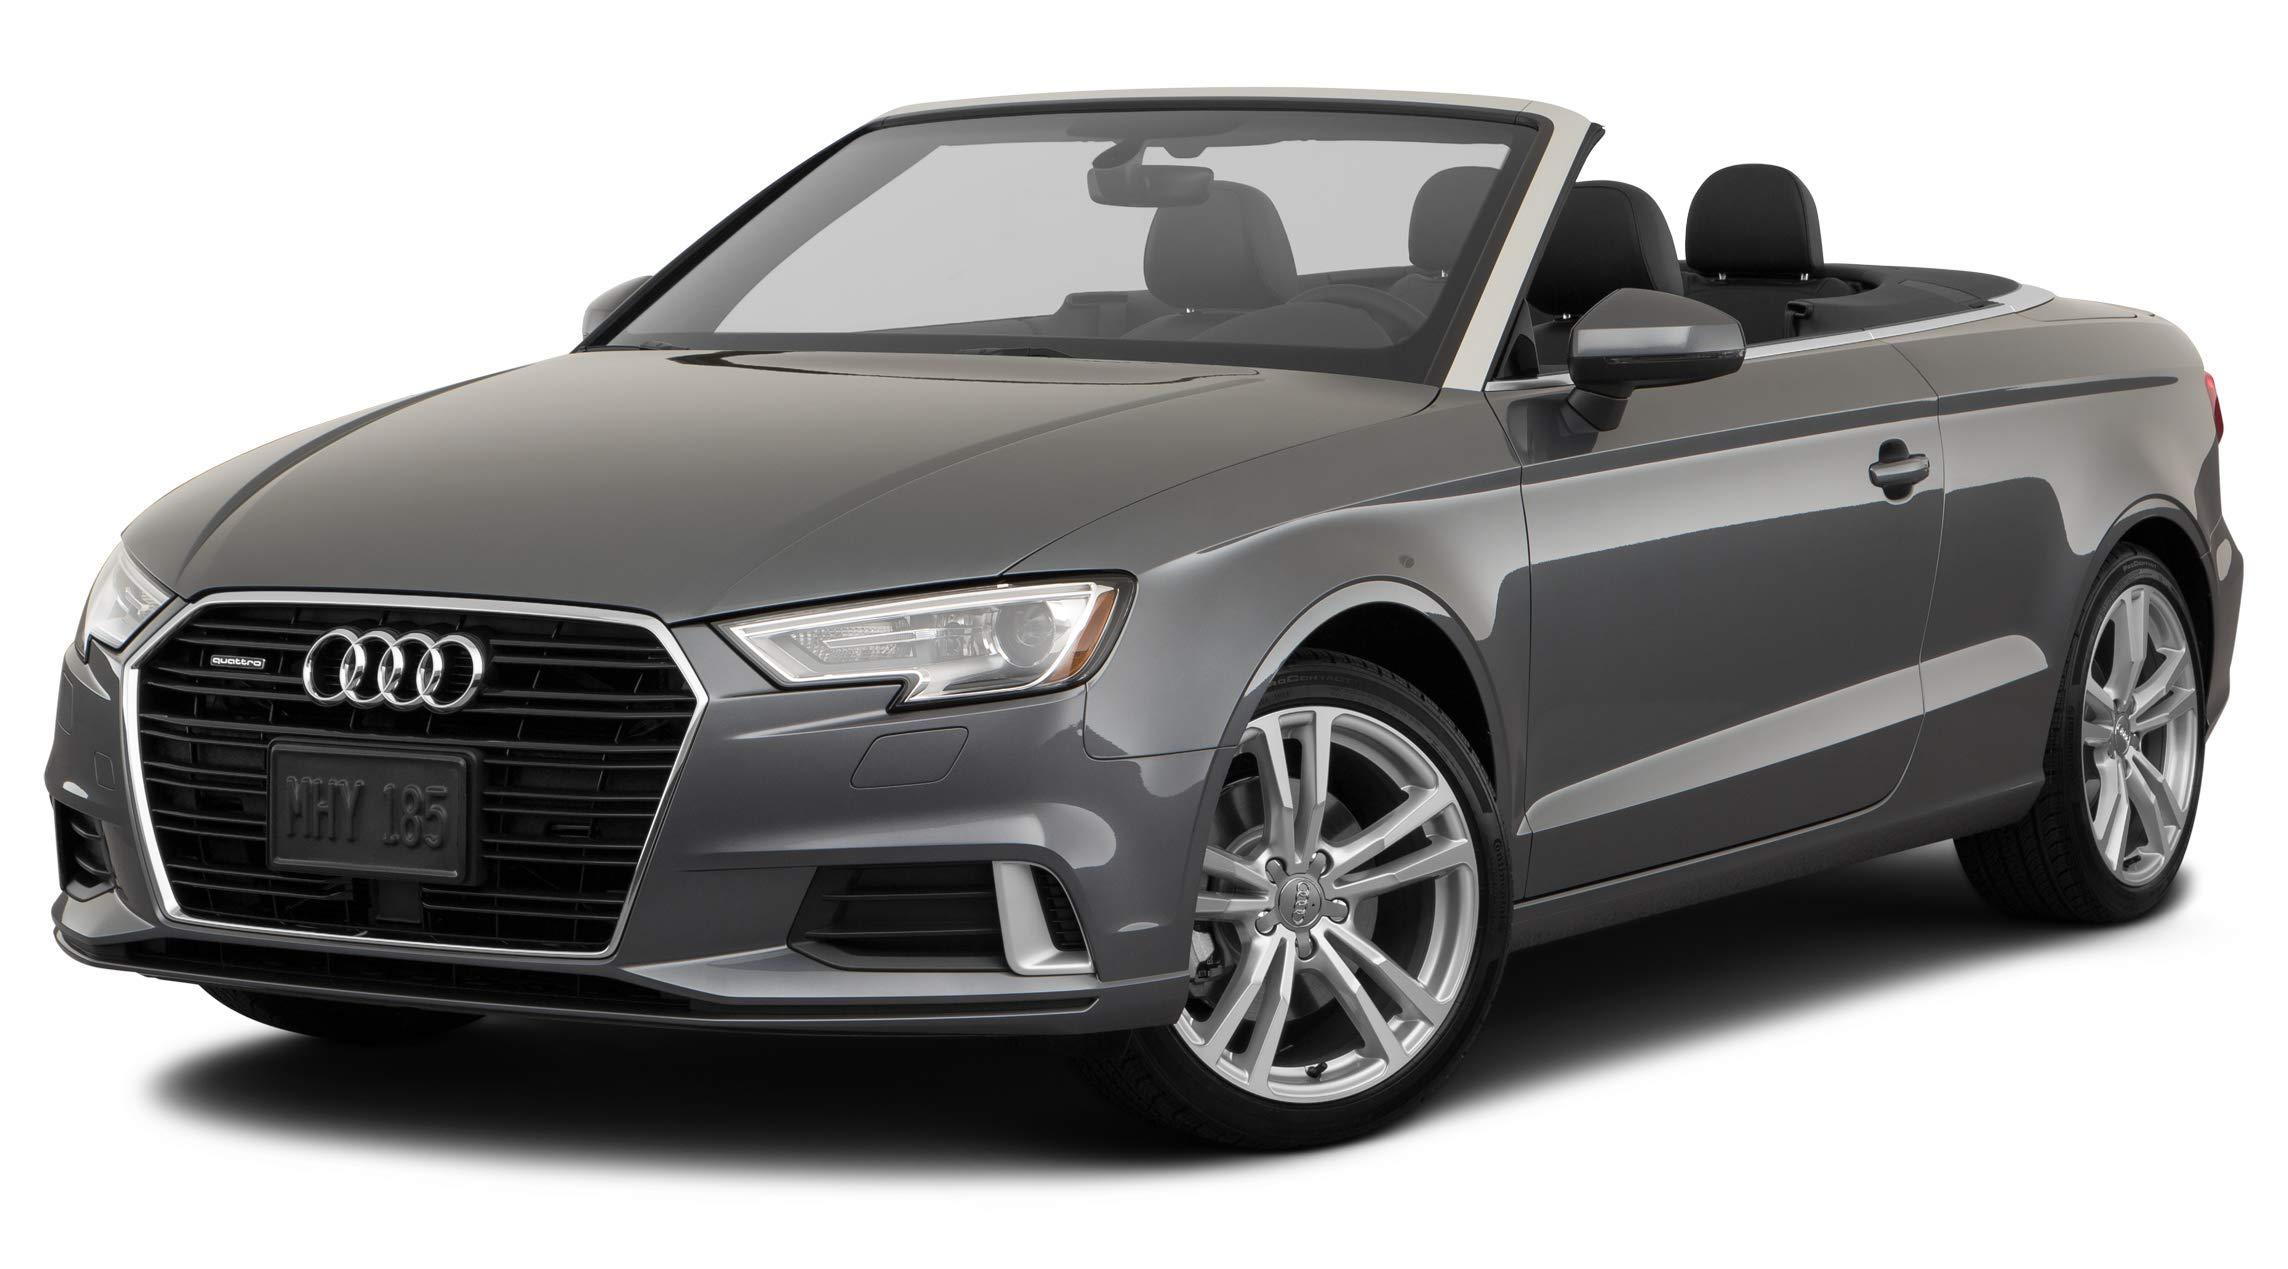 Amazon 2018 Audi A3 Quattro Reviews and Specs Vehicles